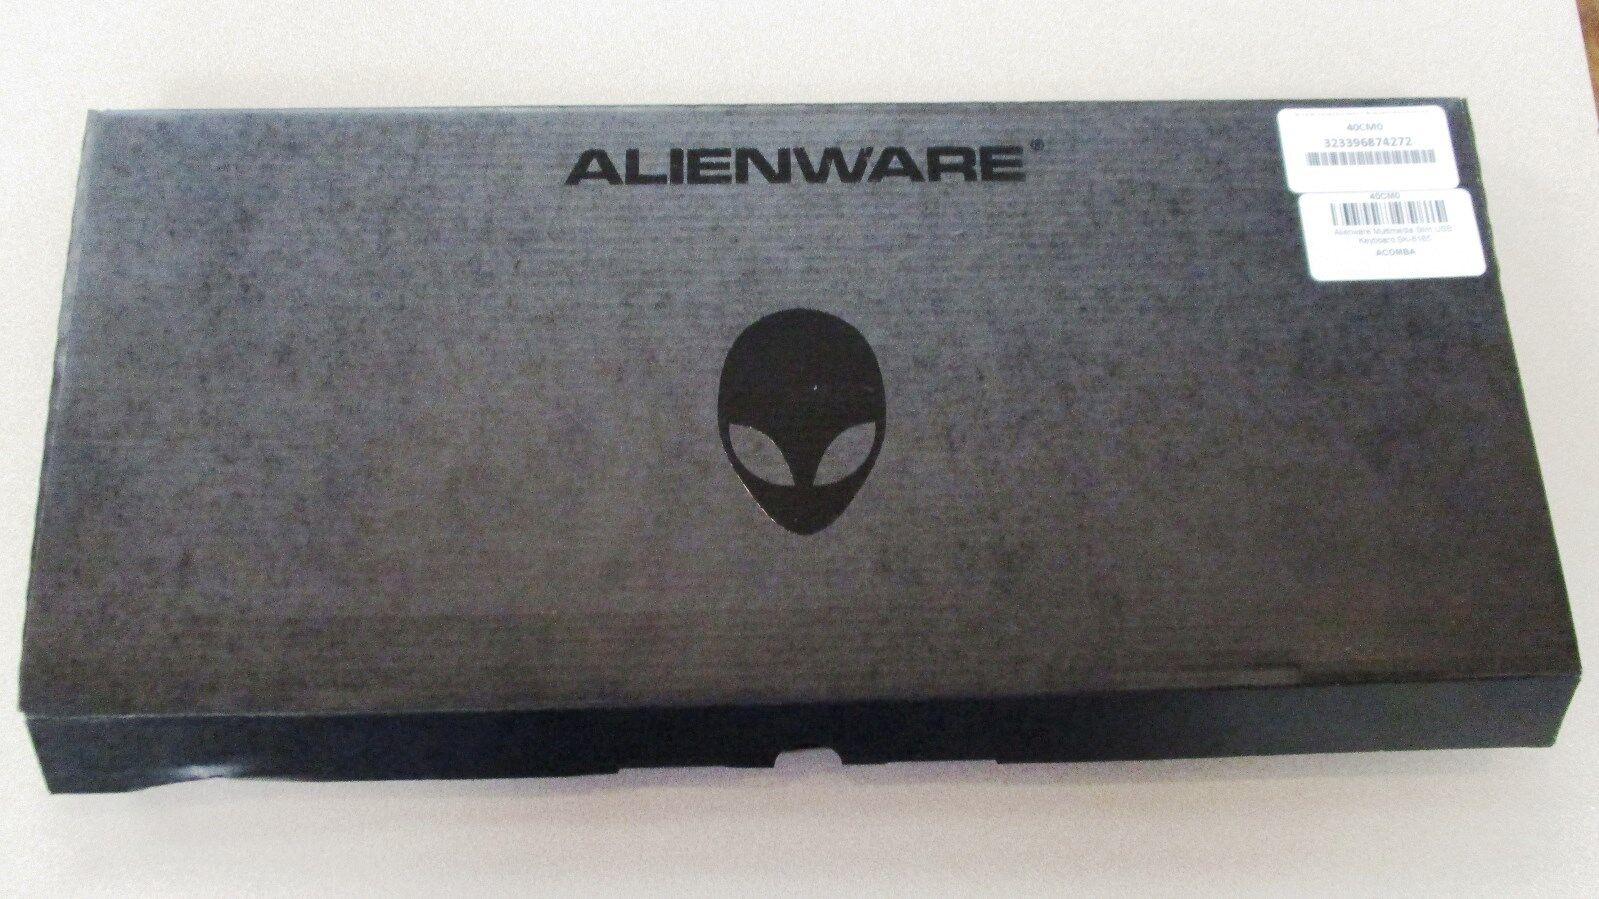 NEW Dell AlienWARE Multimedia  Black USB Keyboard 40CM0 SK-8165. Buy it now for 28.95